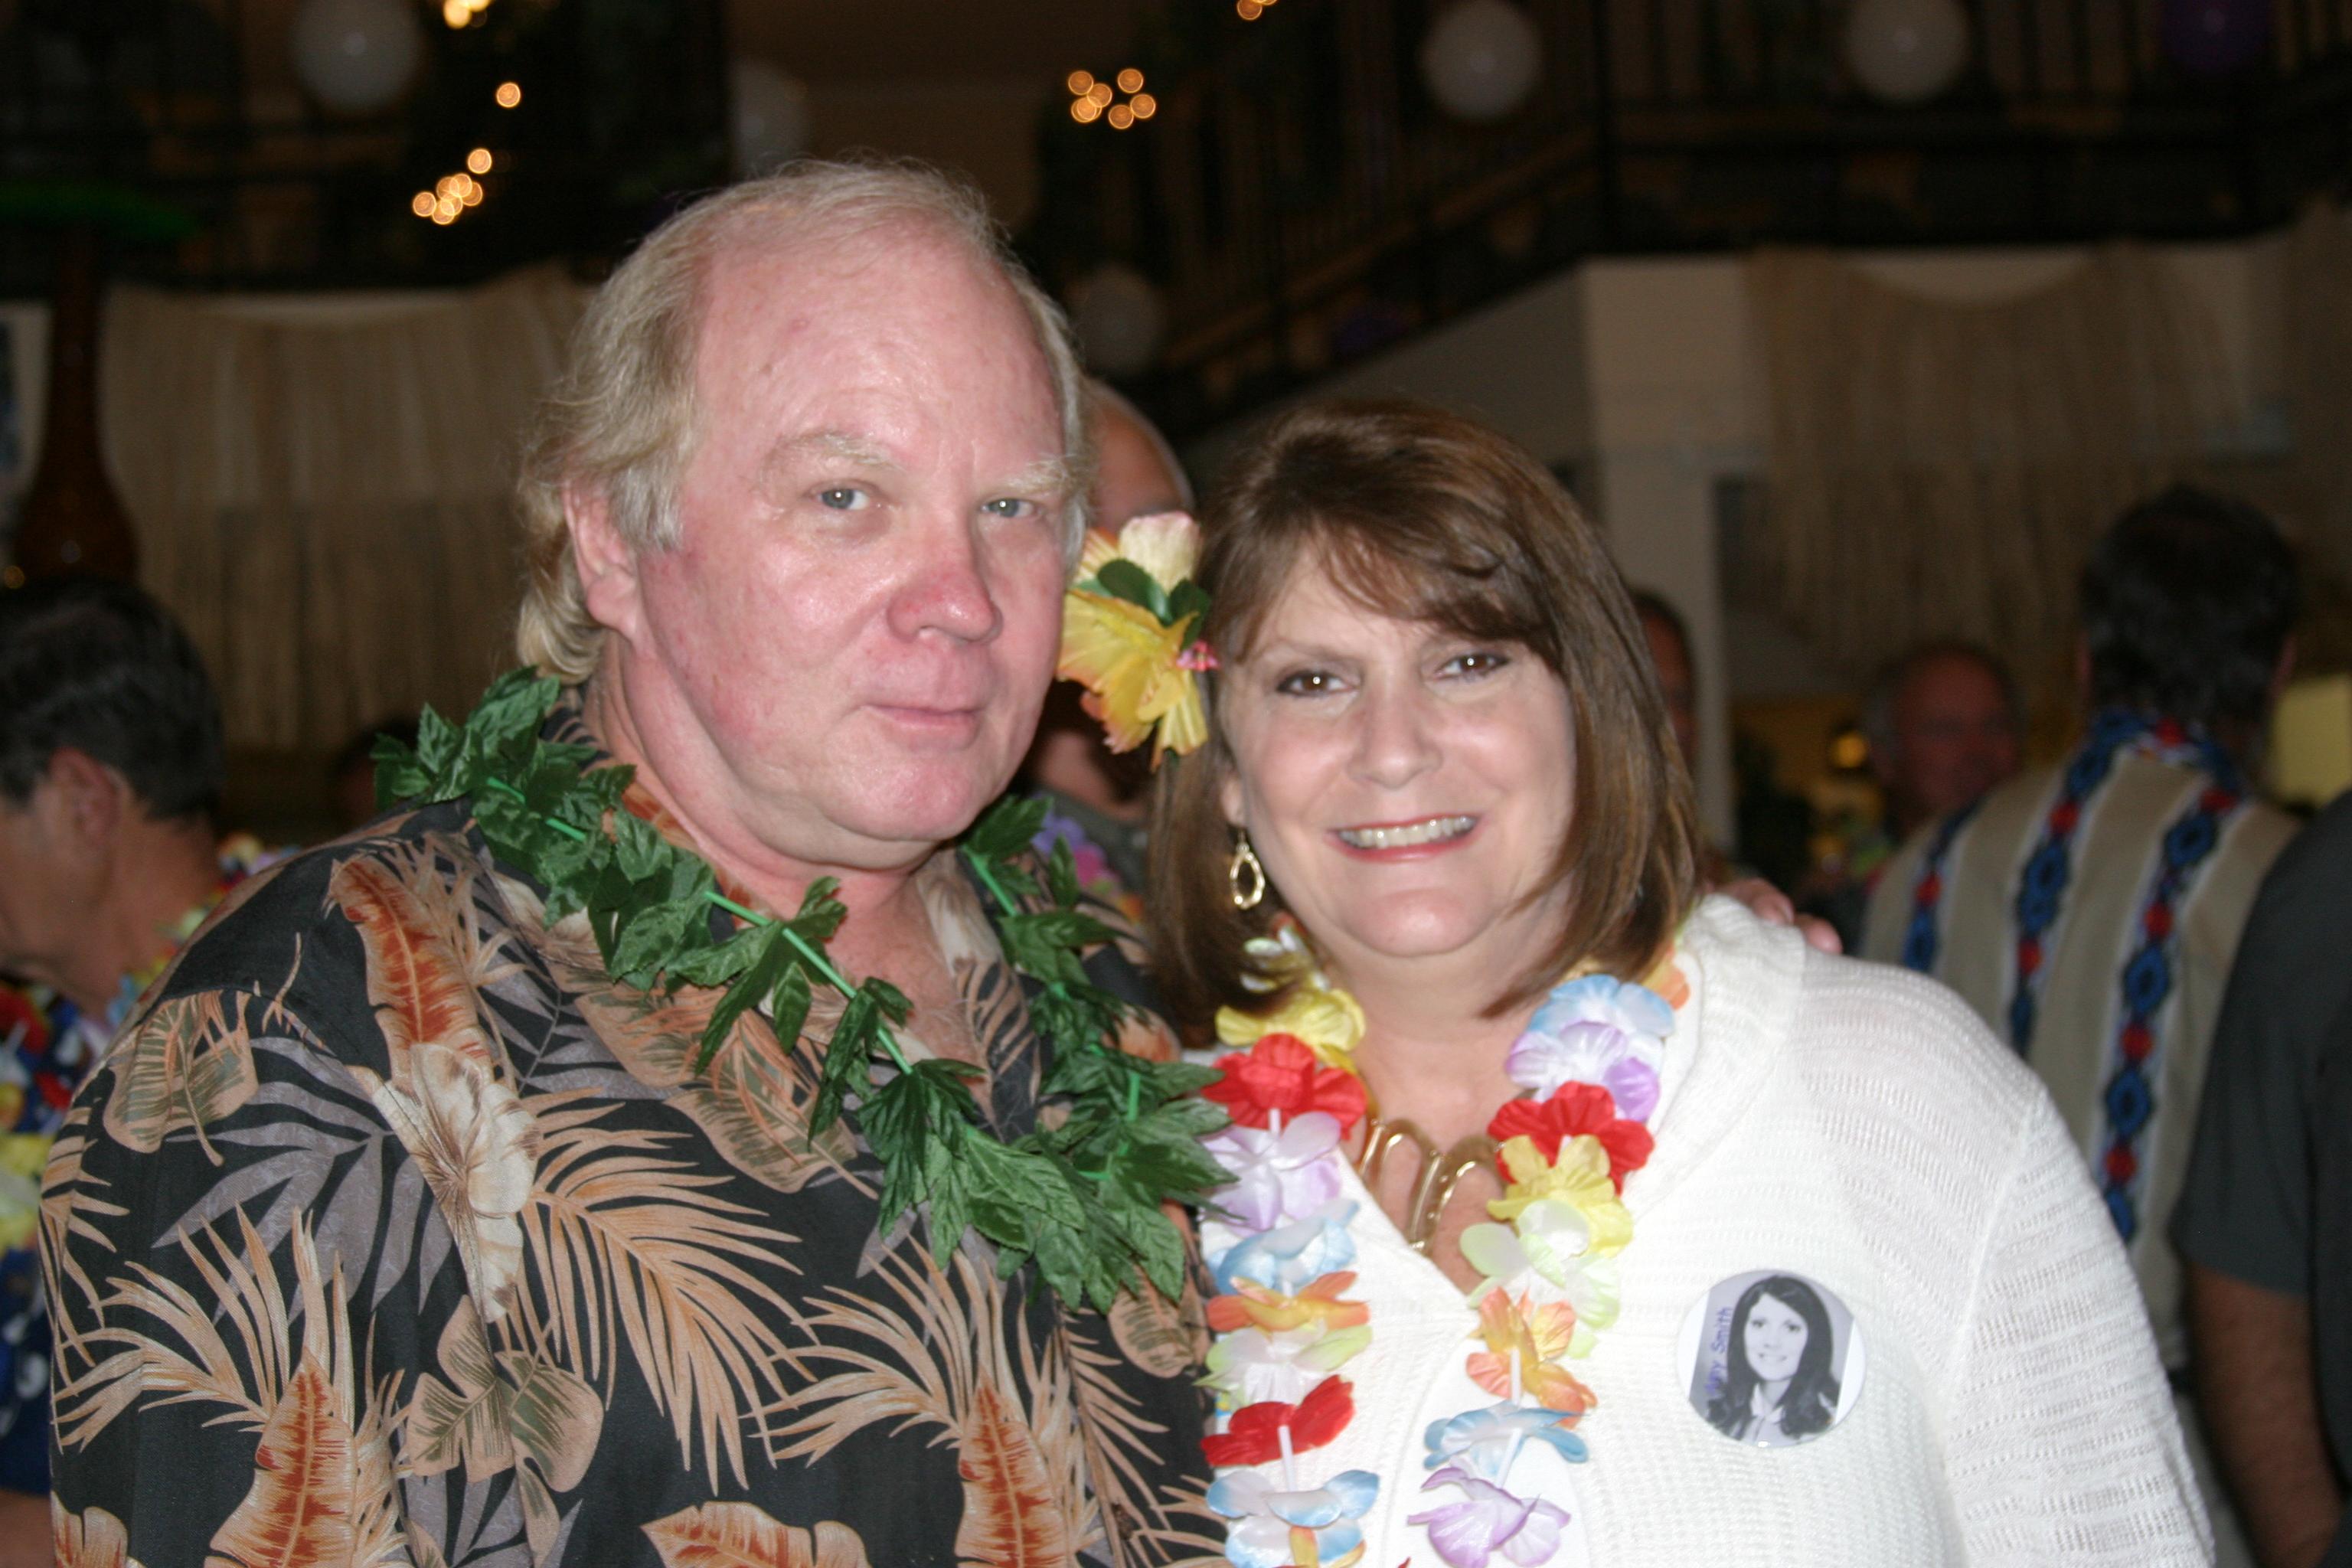 Bruce Tinch & Amy Smith Tinch